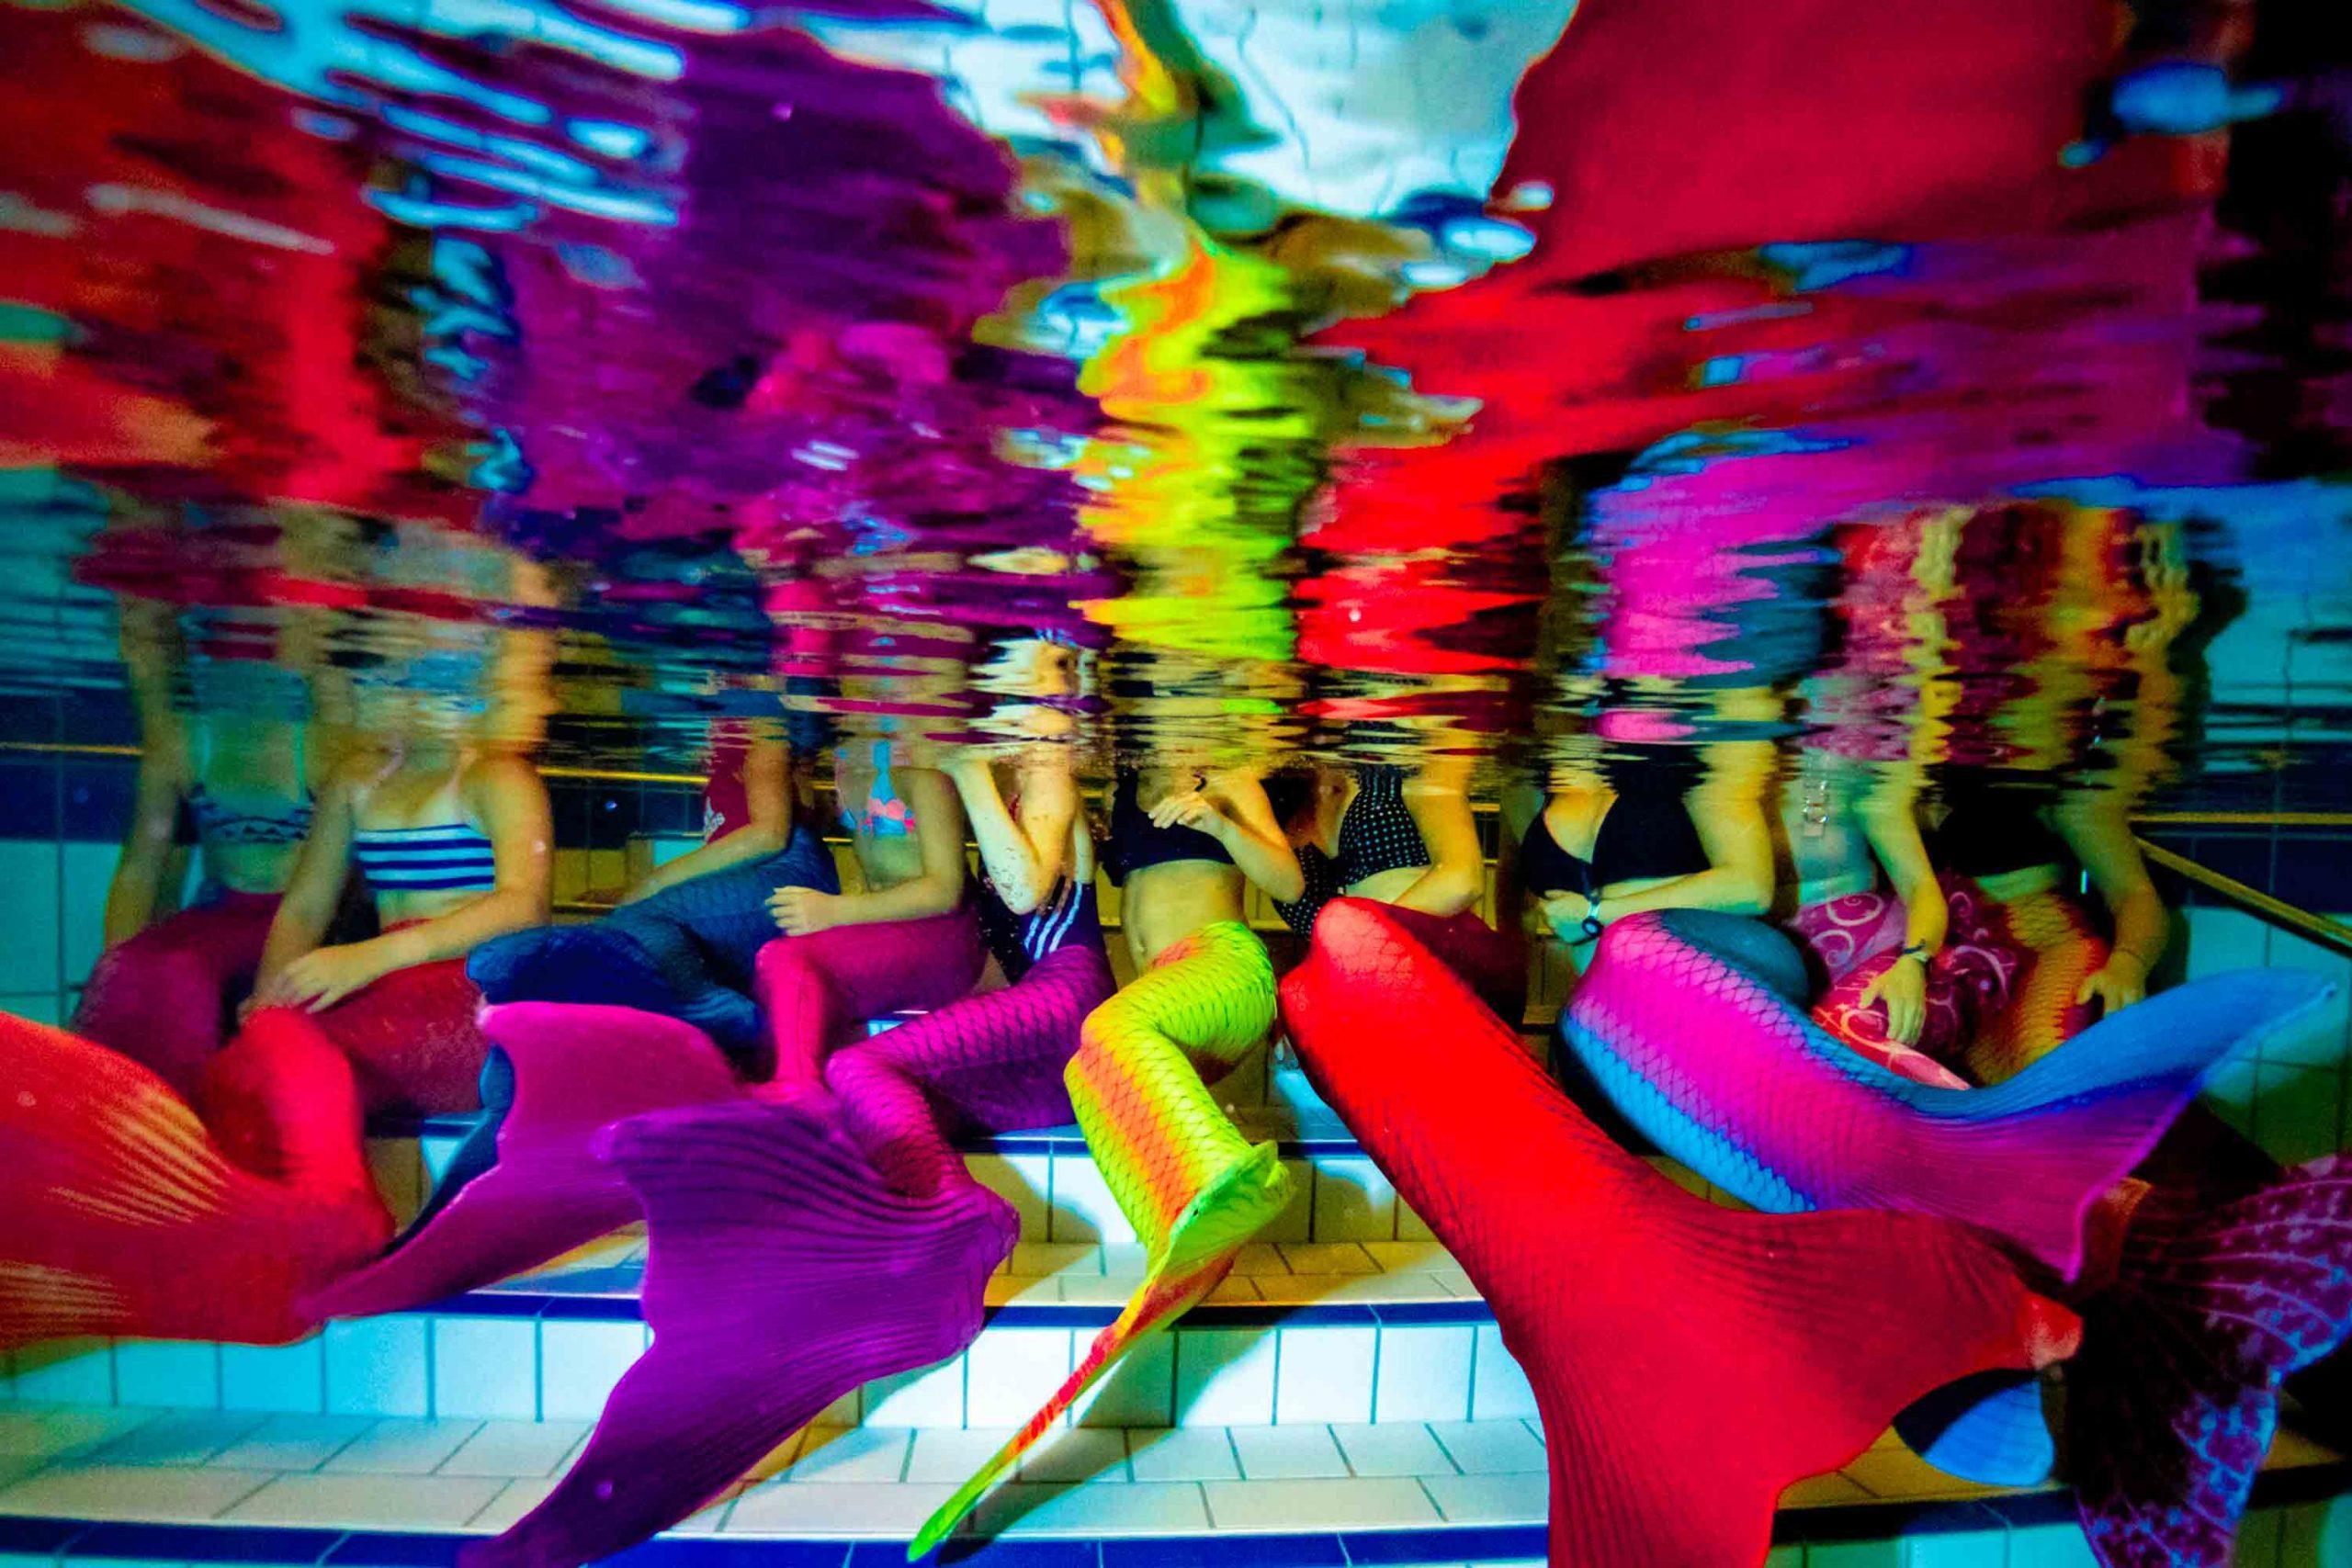 Mermaidingkurse in Dresden